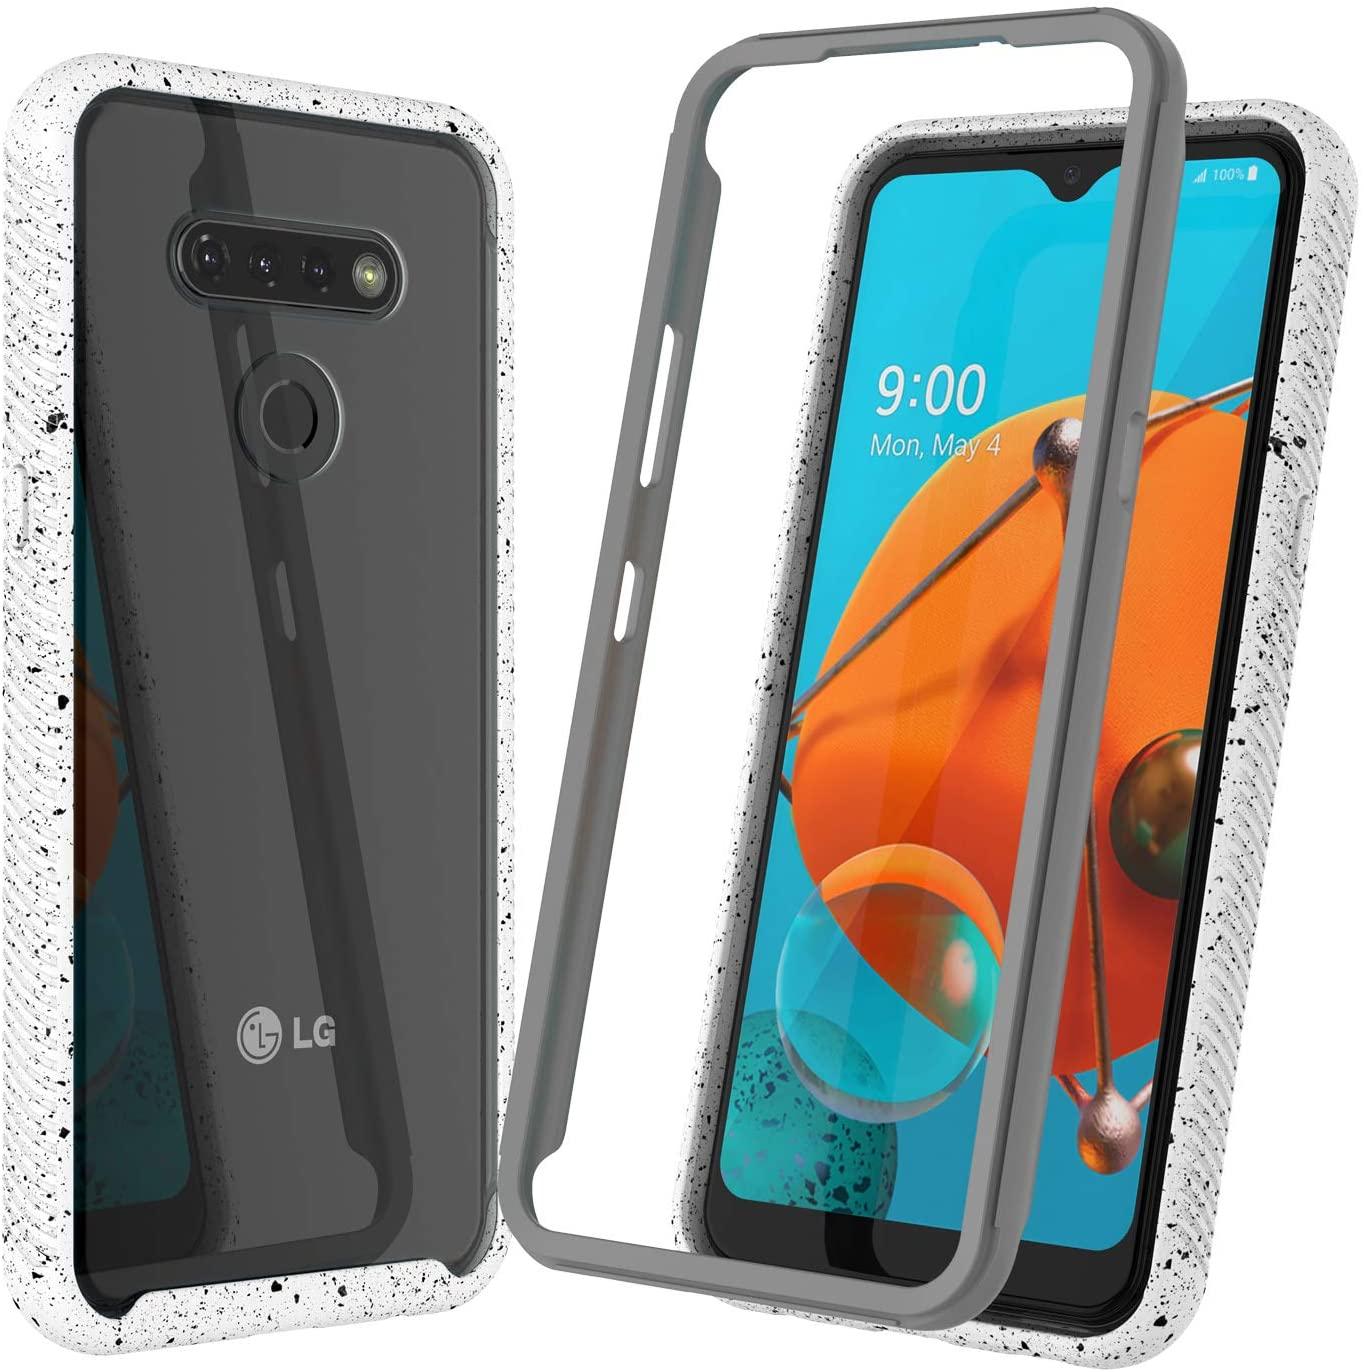 Njjex for LG K51 Case, LG Q51 / LG Reflect Case 2020, [Npatt] Hybrid Impact Transparent Clear Back Soft TPU Bumper Case + PC Plastic Front Cover Shockproof Phone Cover for LG K51/Q51 [6.5